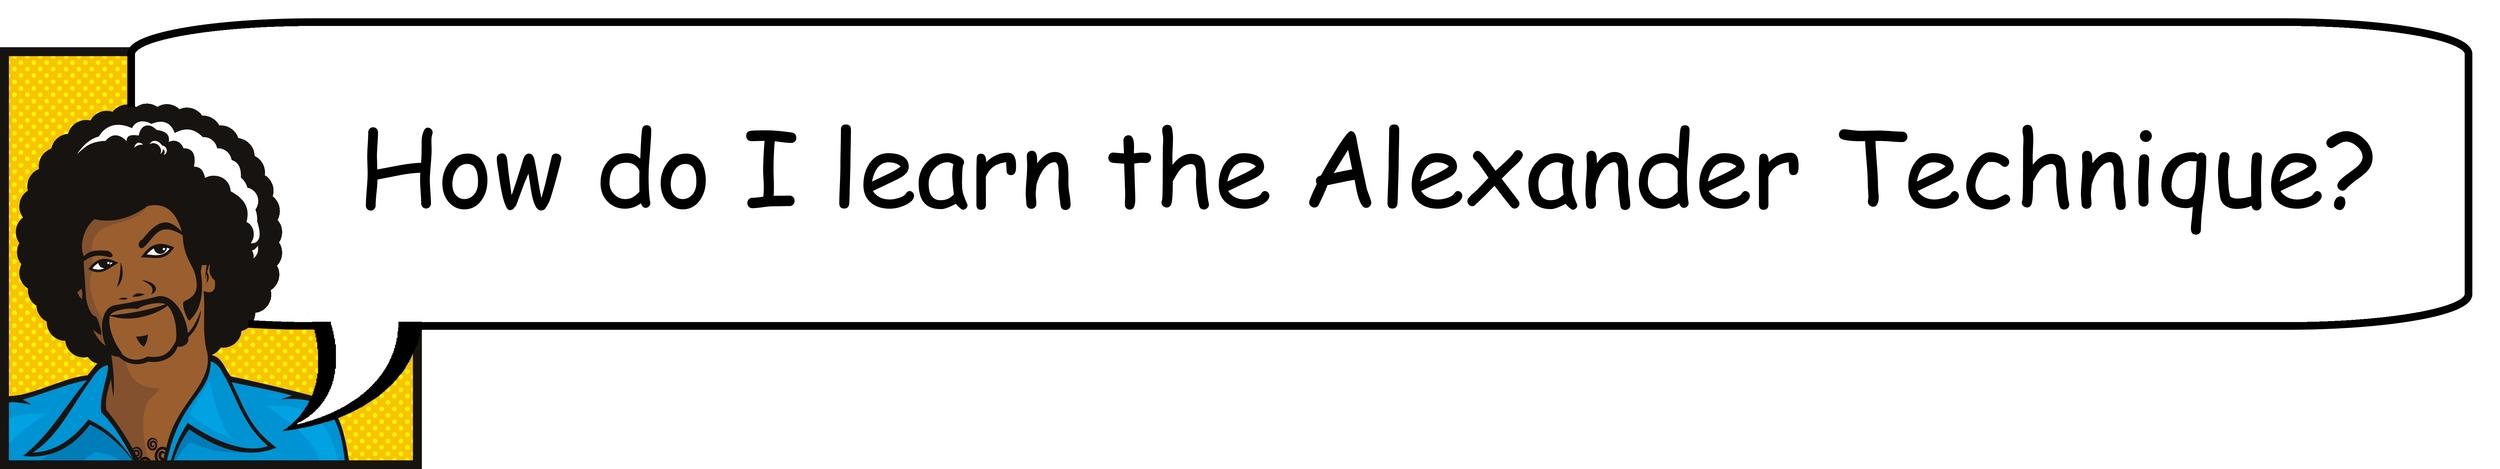 How do I learn the Alexander Technique?